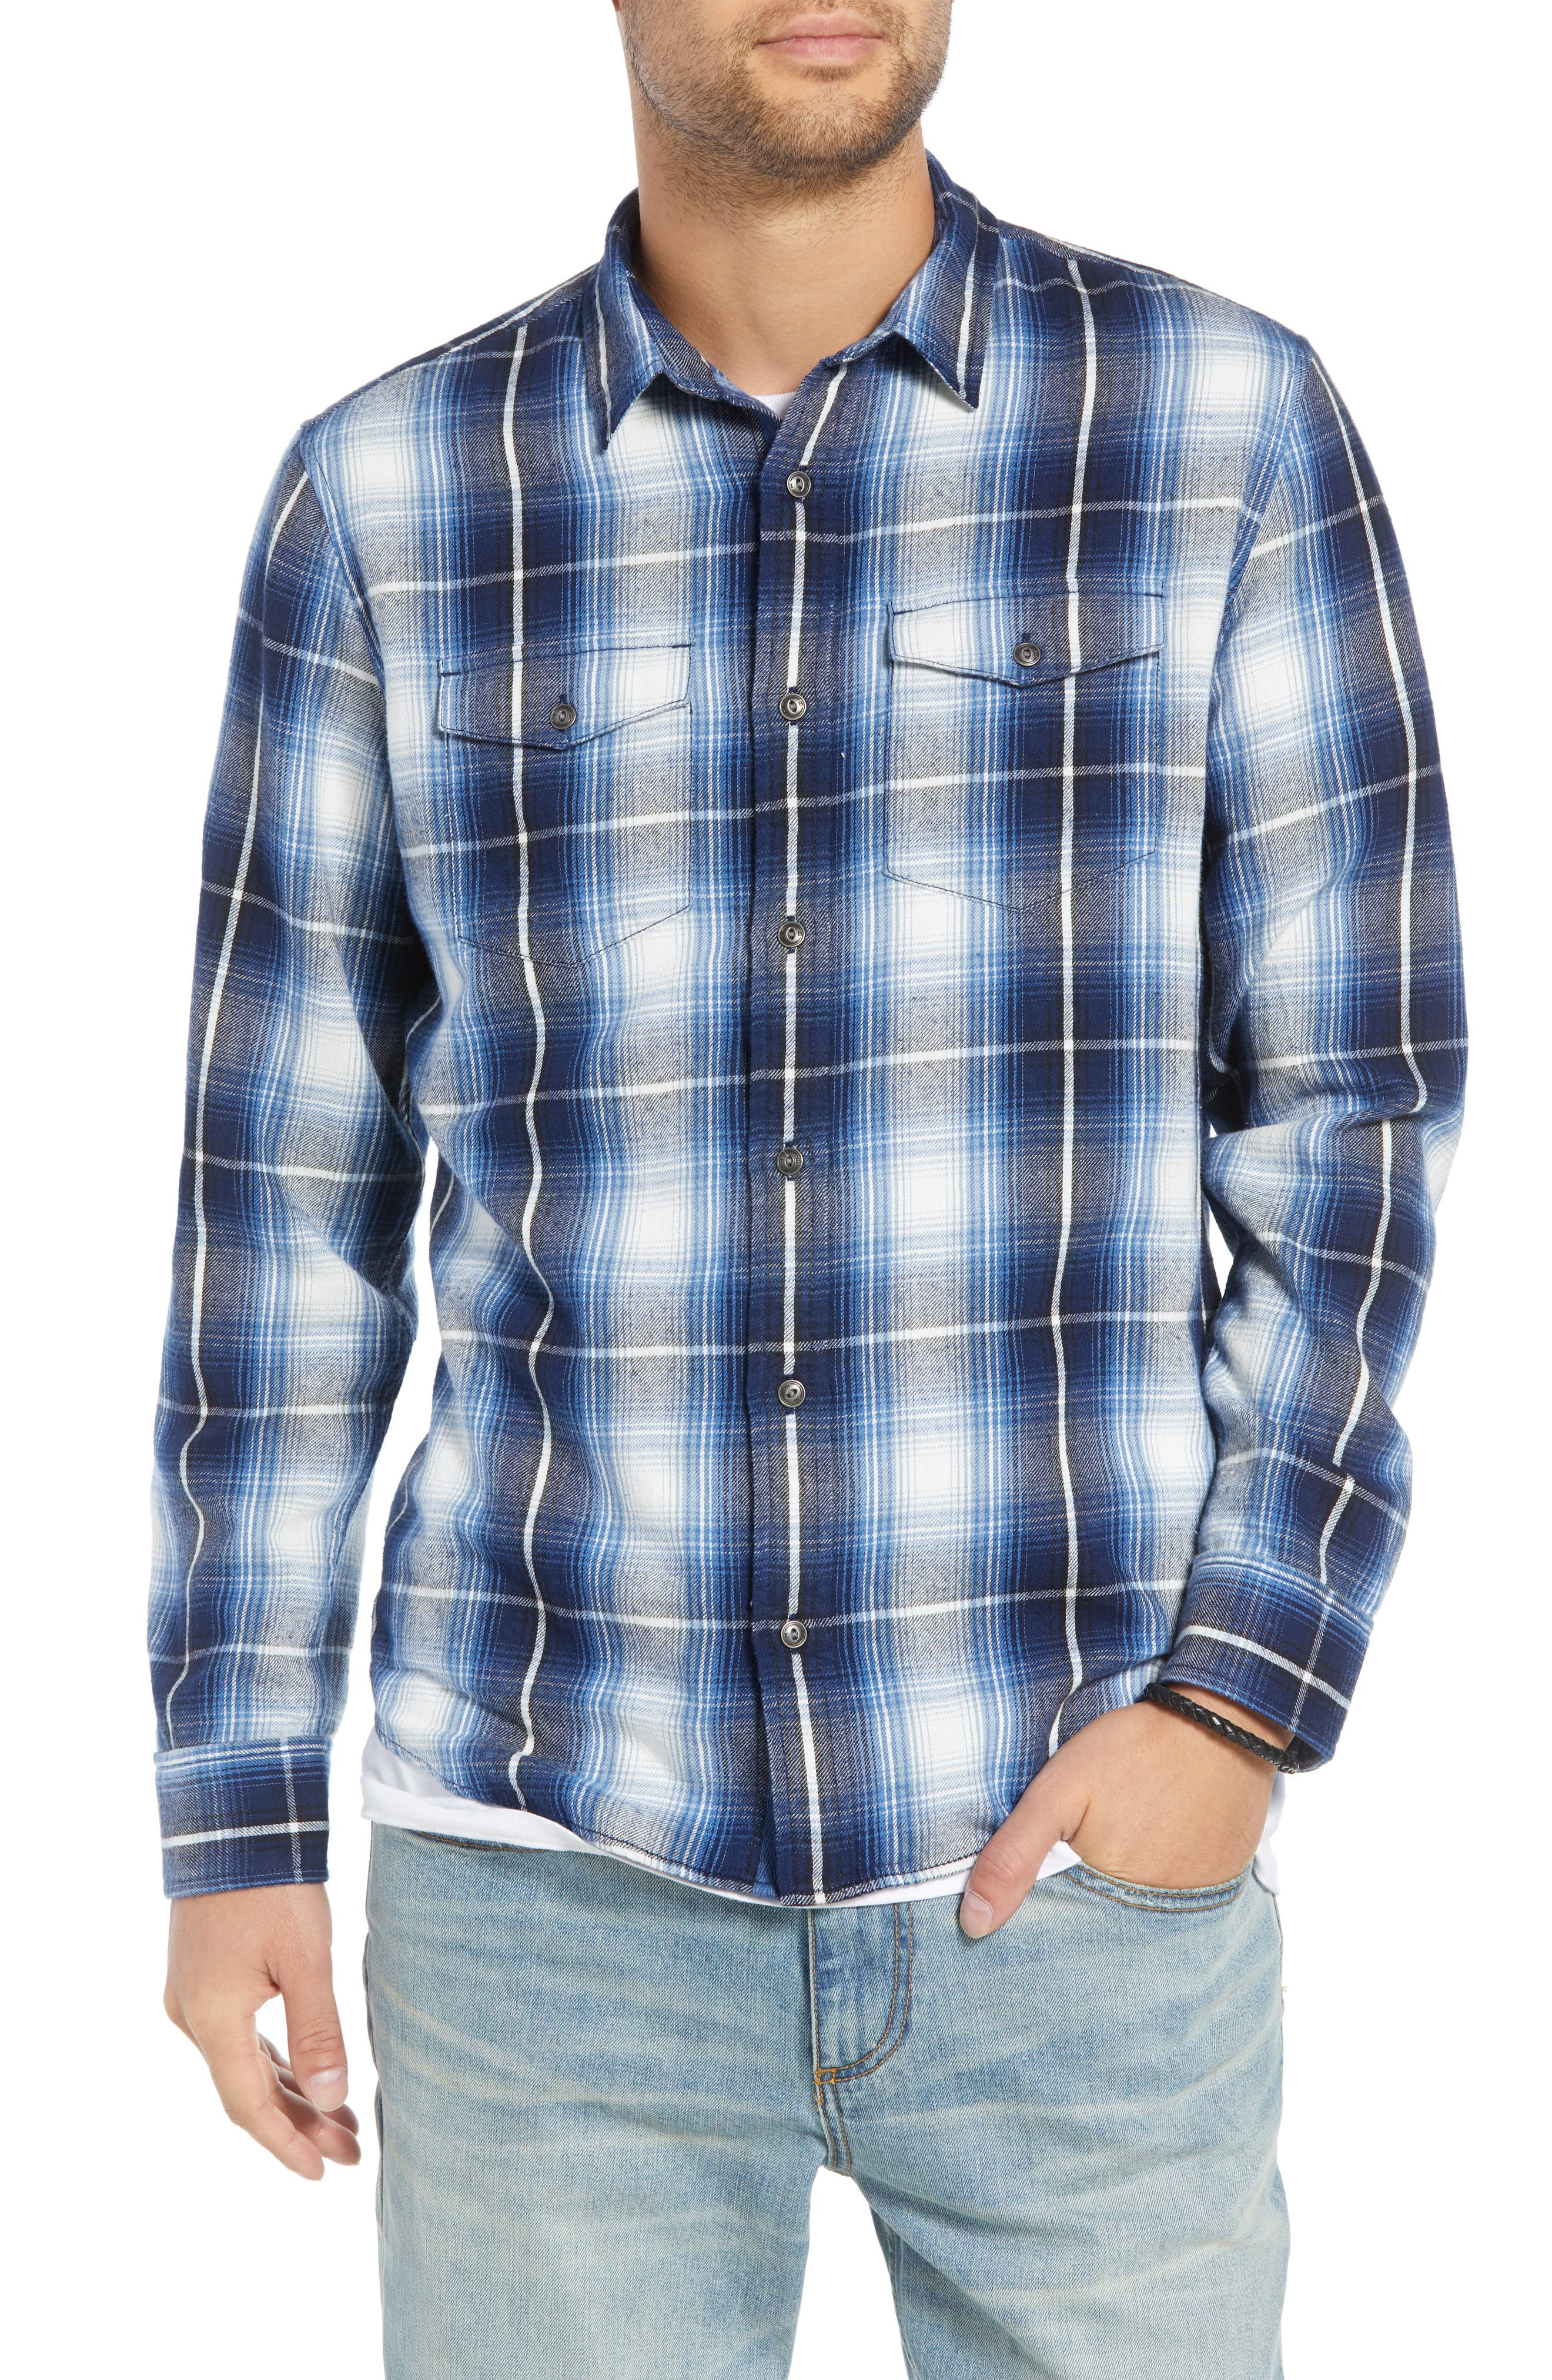 Slim Fit Plaid Flap Pocket Sport Shirt,                             Main thumbnail 1, color,                             BLUE CASPIA RIVER PLAID